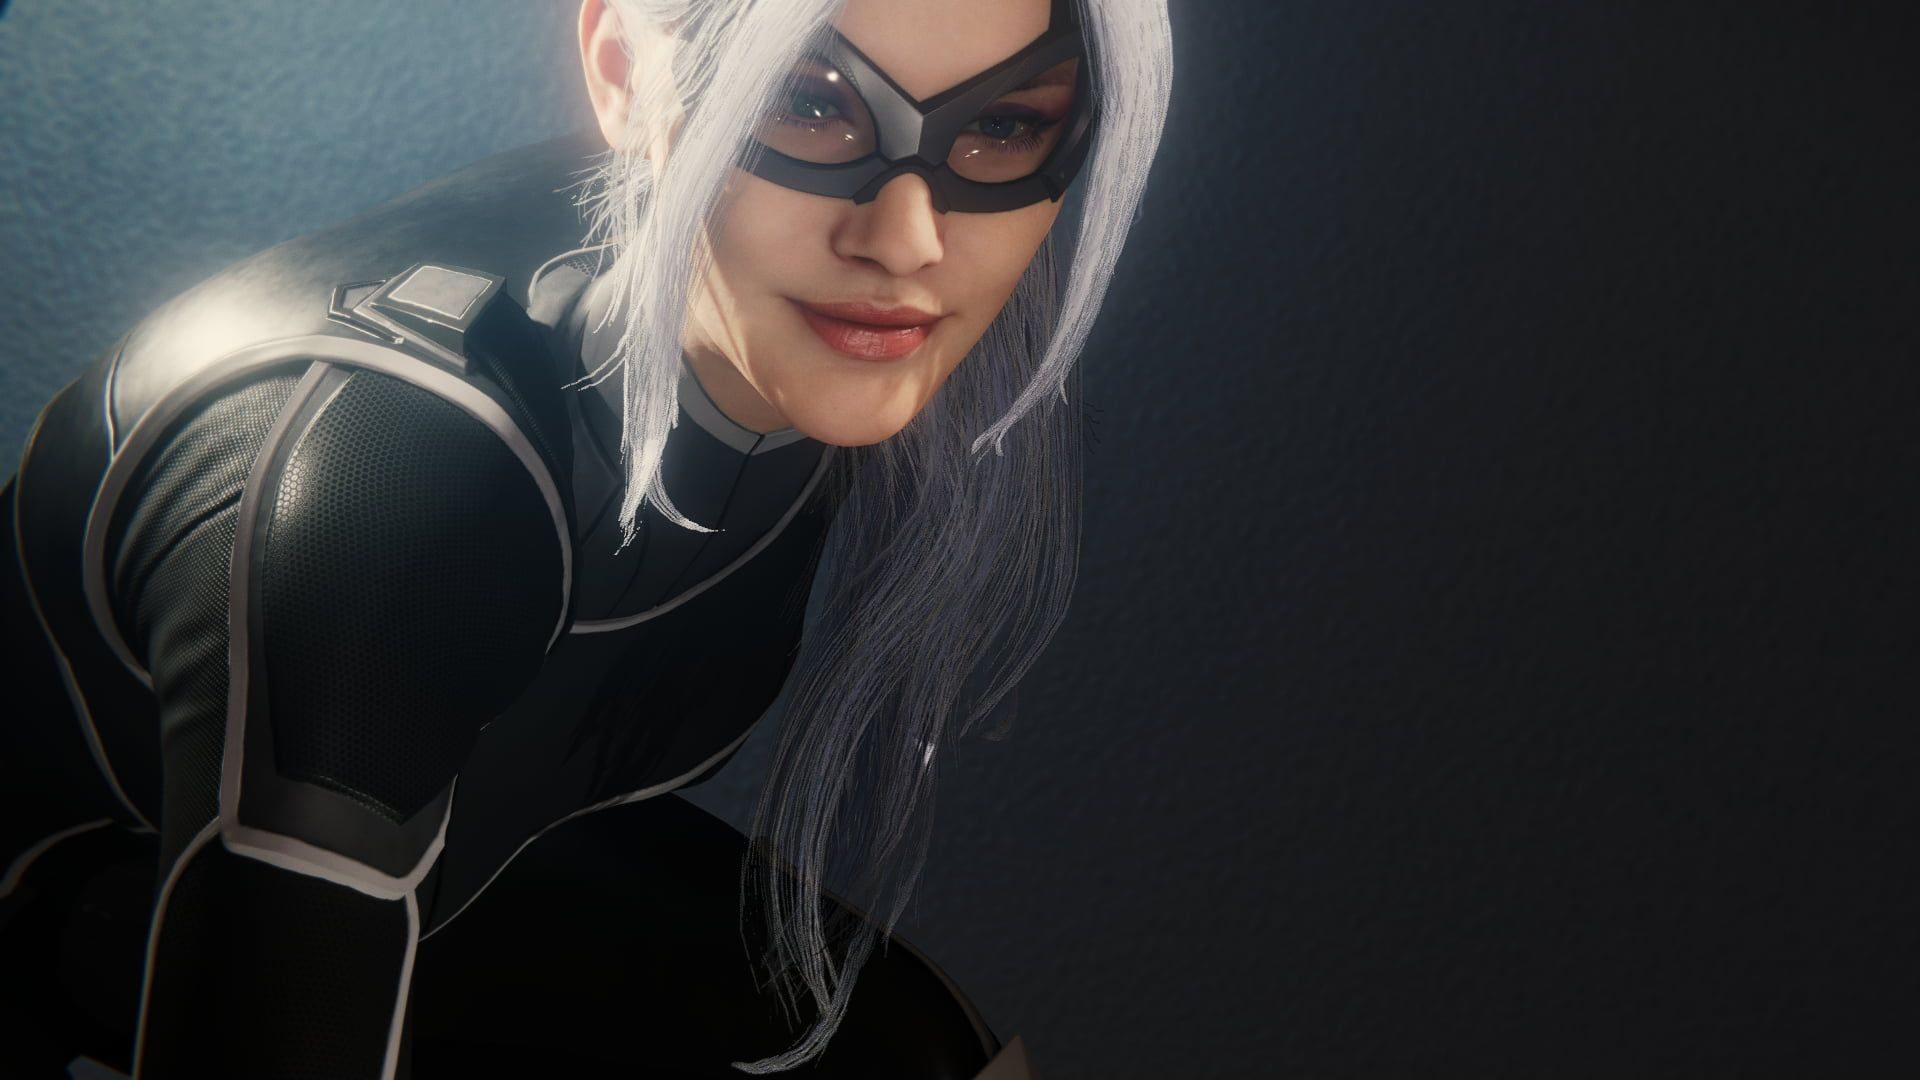 Spider Man Playstation 4 Marvel Comics Video Games Black Cat Character 1080p Wallpaper Hdwallpaper Desktop In 2020 Marvel Comics Cat Character Spiderman